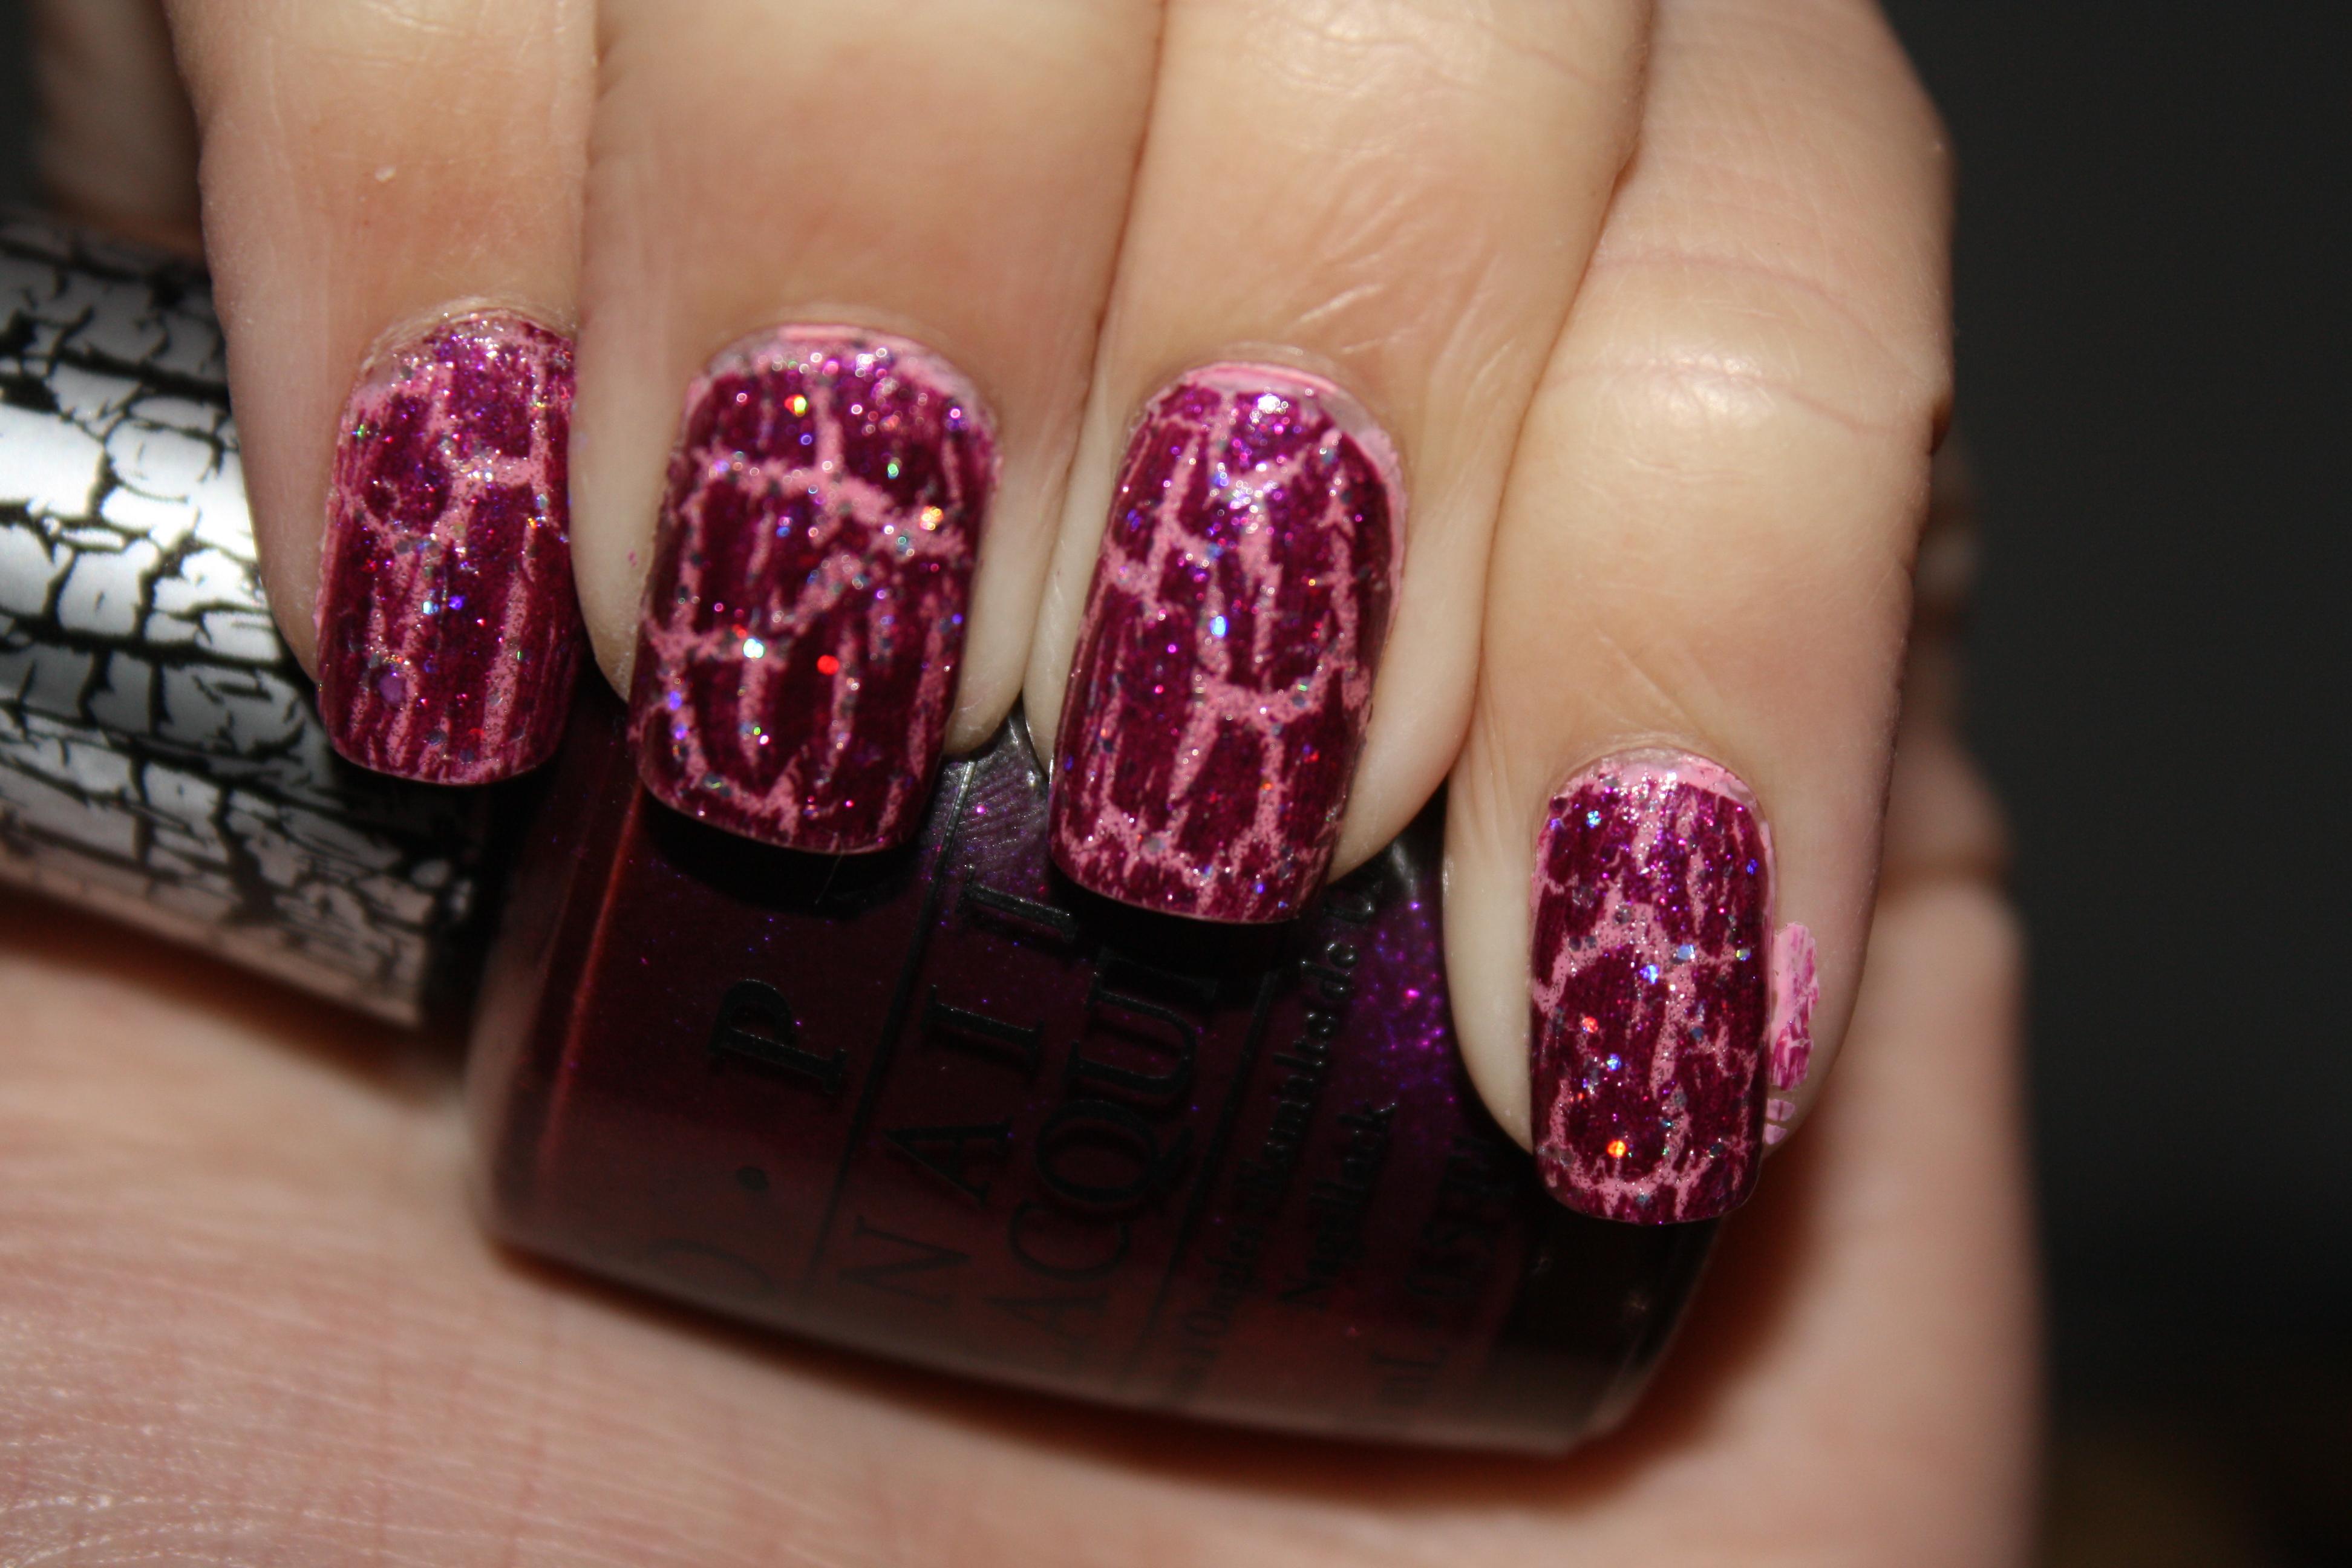 Nicki Minaj by OPI Super Bass Shatter Nail Polish Review, Swatches ...